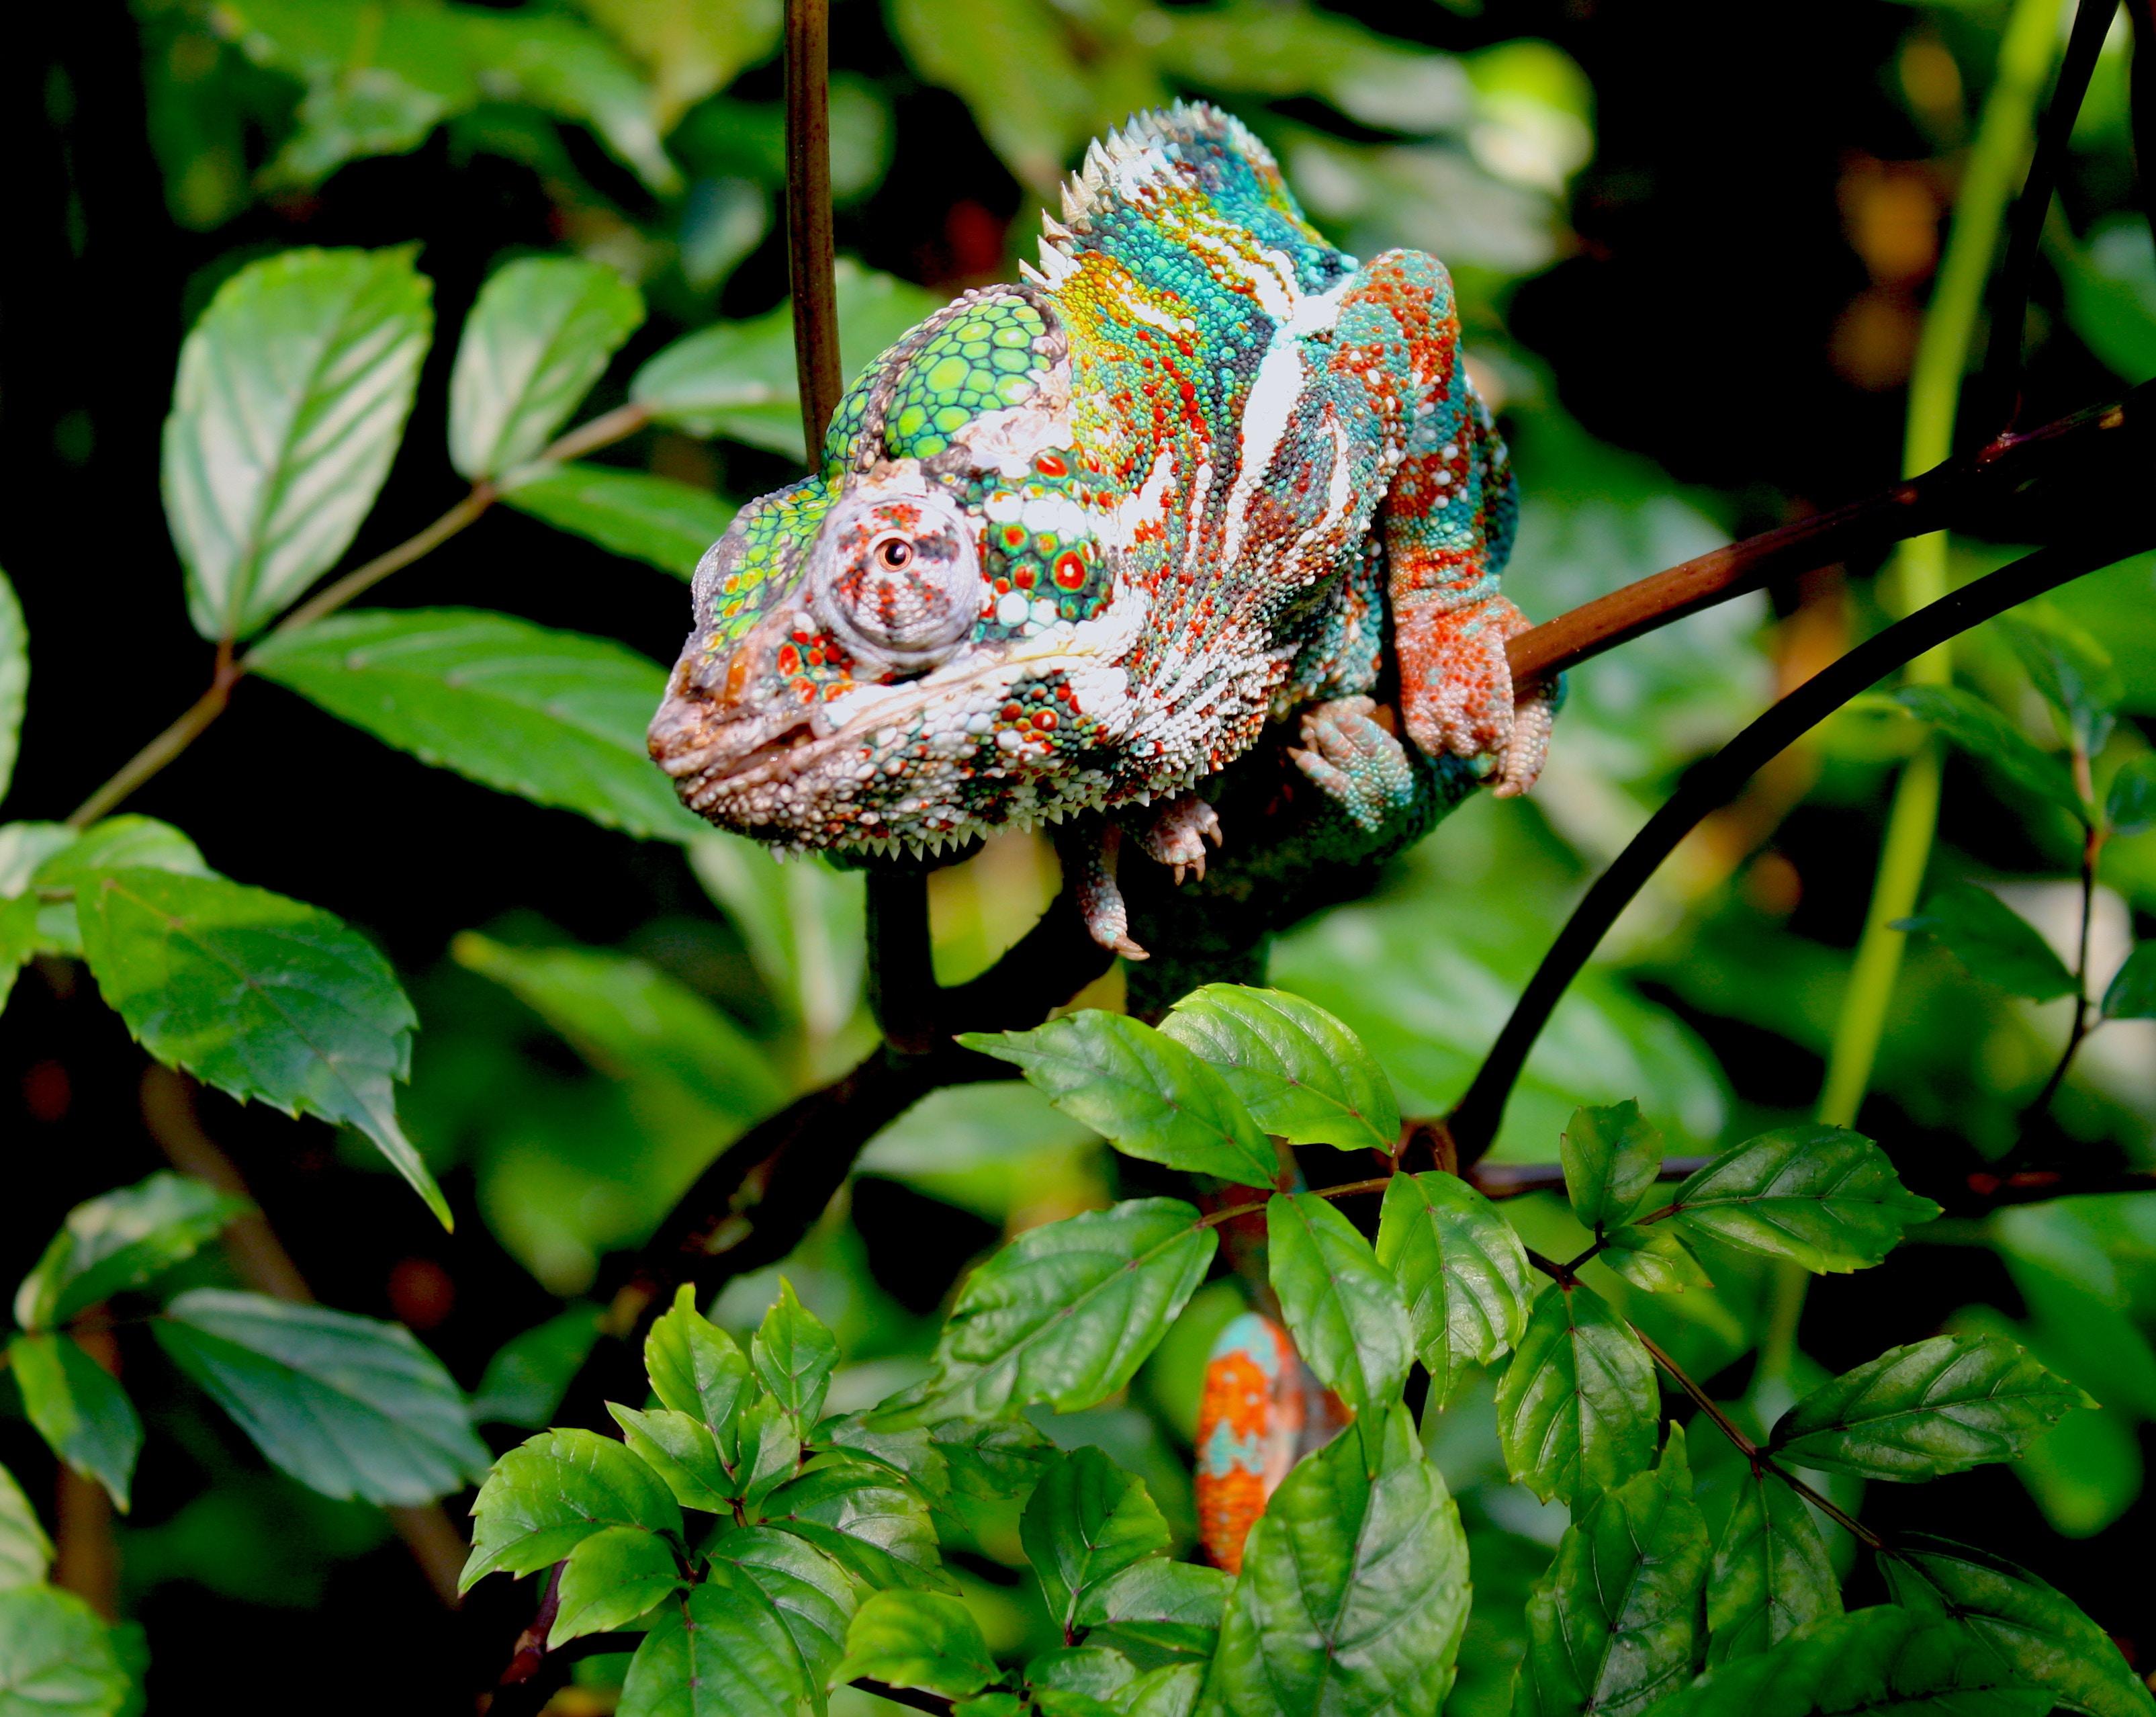 chameleon sitting on branch